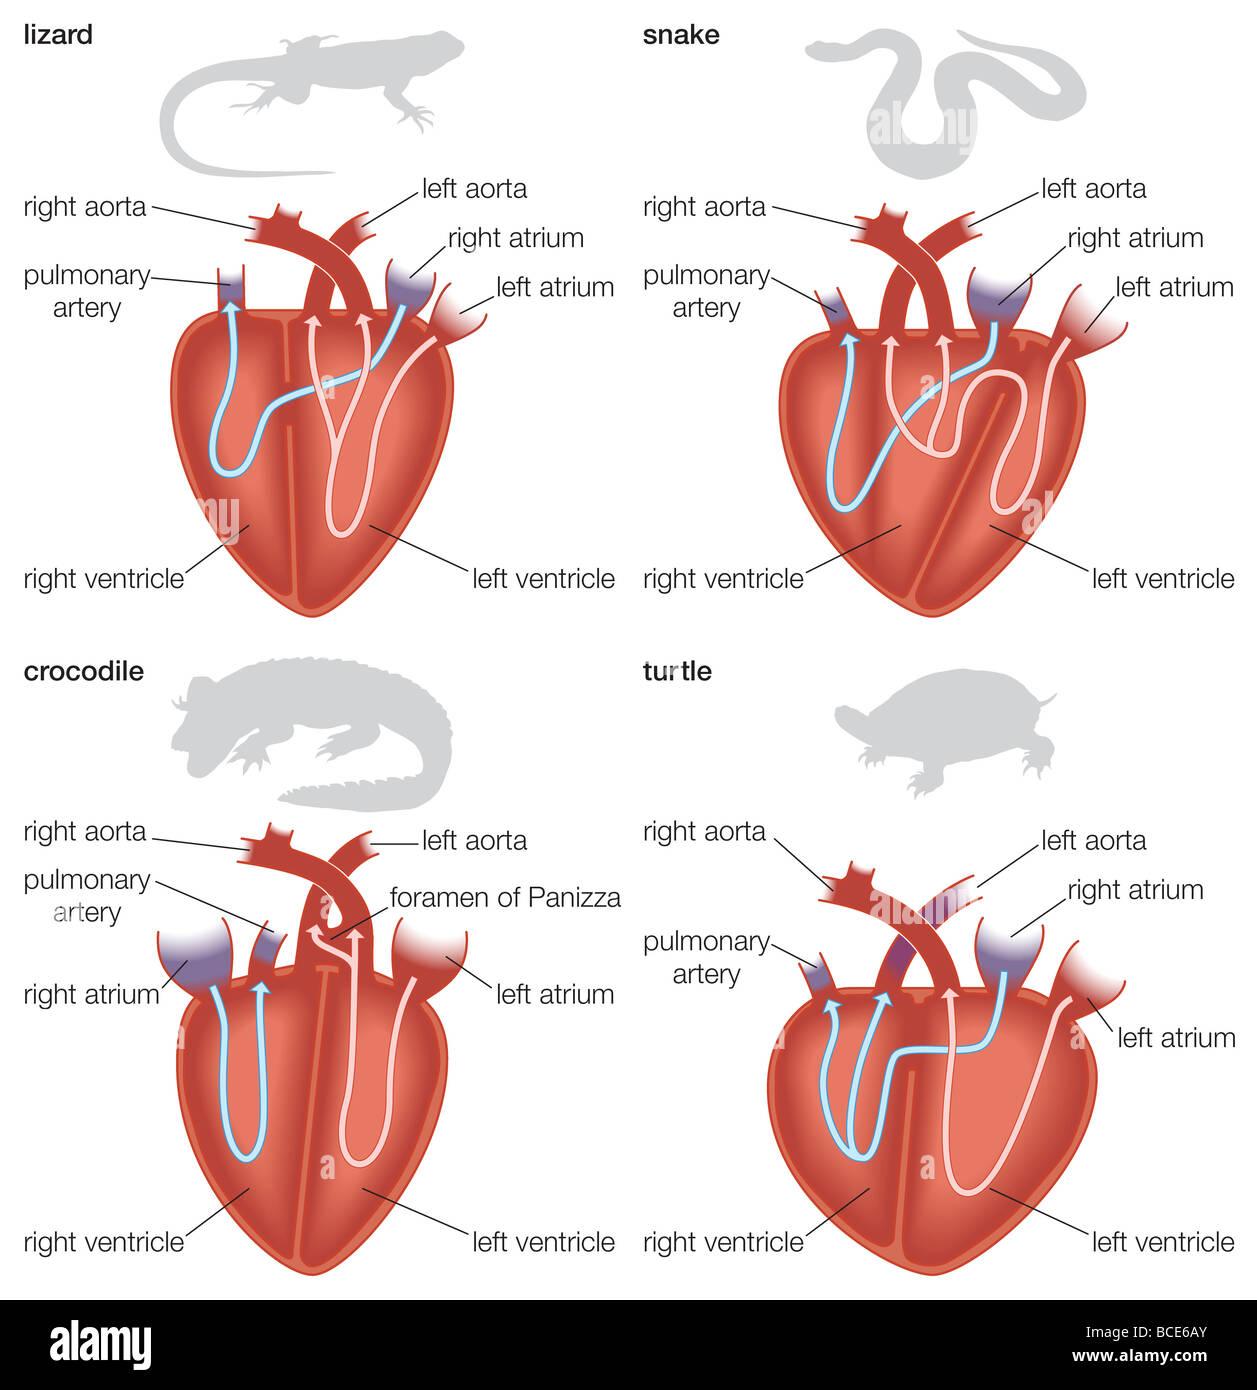 Reptile Heart Anatomy Diagram - Electrical Work Wiring Diagram •